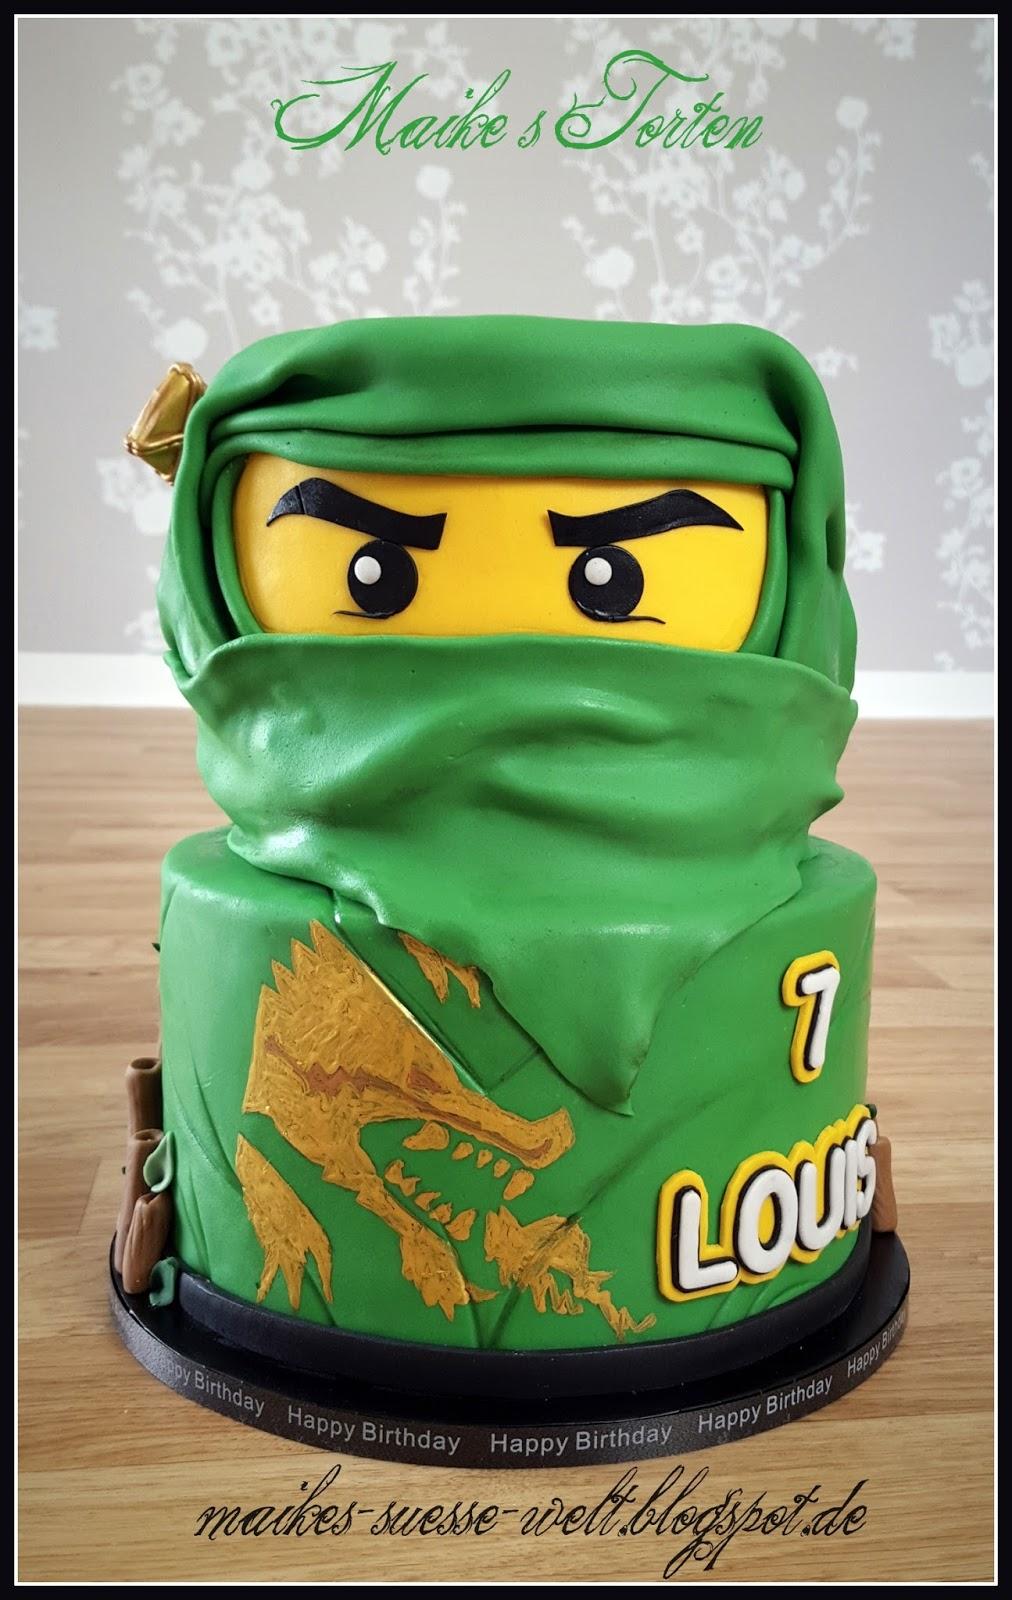 Maikes se Welt Lego Ninjago Torten